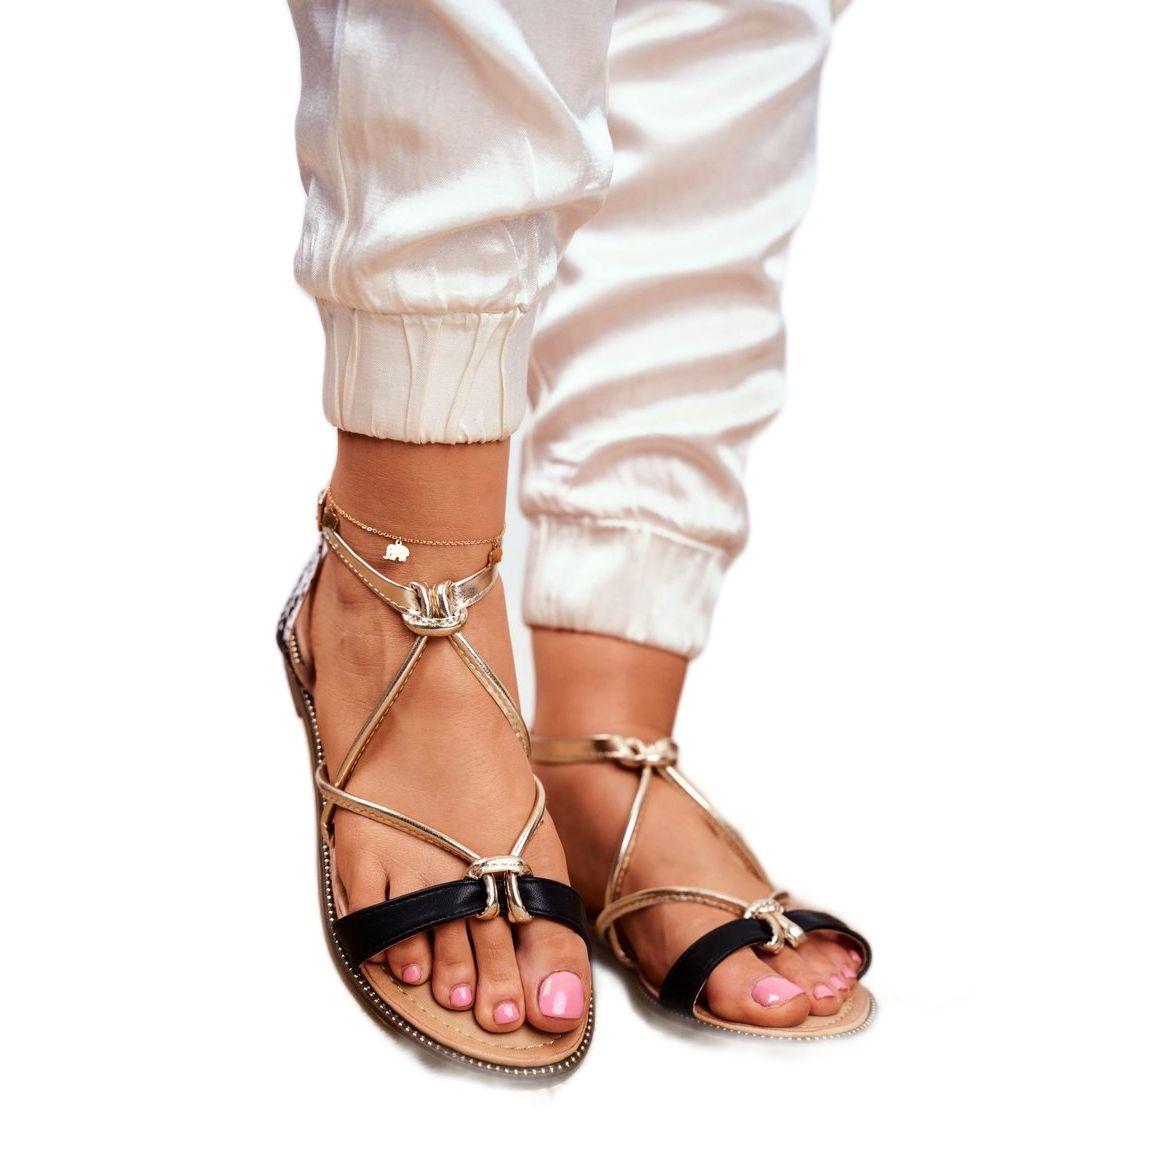 S Barski Sandaly Damskie Plaskie Czarno Zlote Barski Samim Czarne Zolte Fashion Shoes Sandals